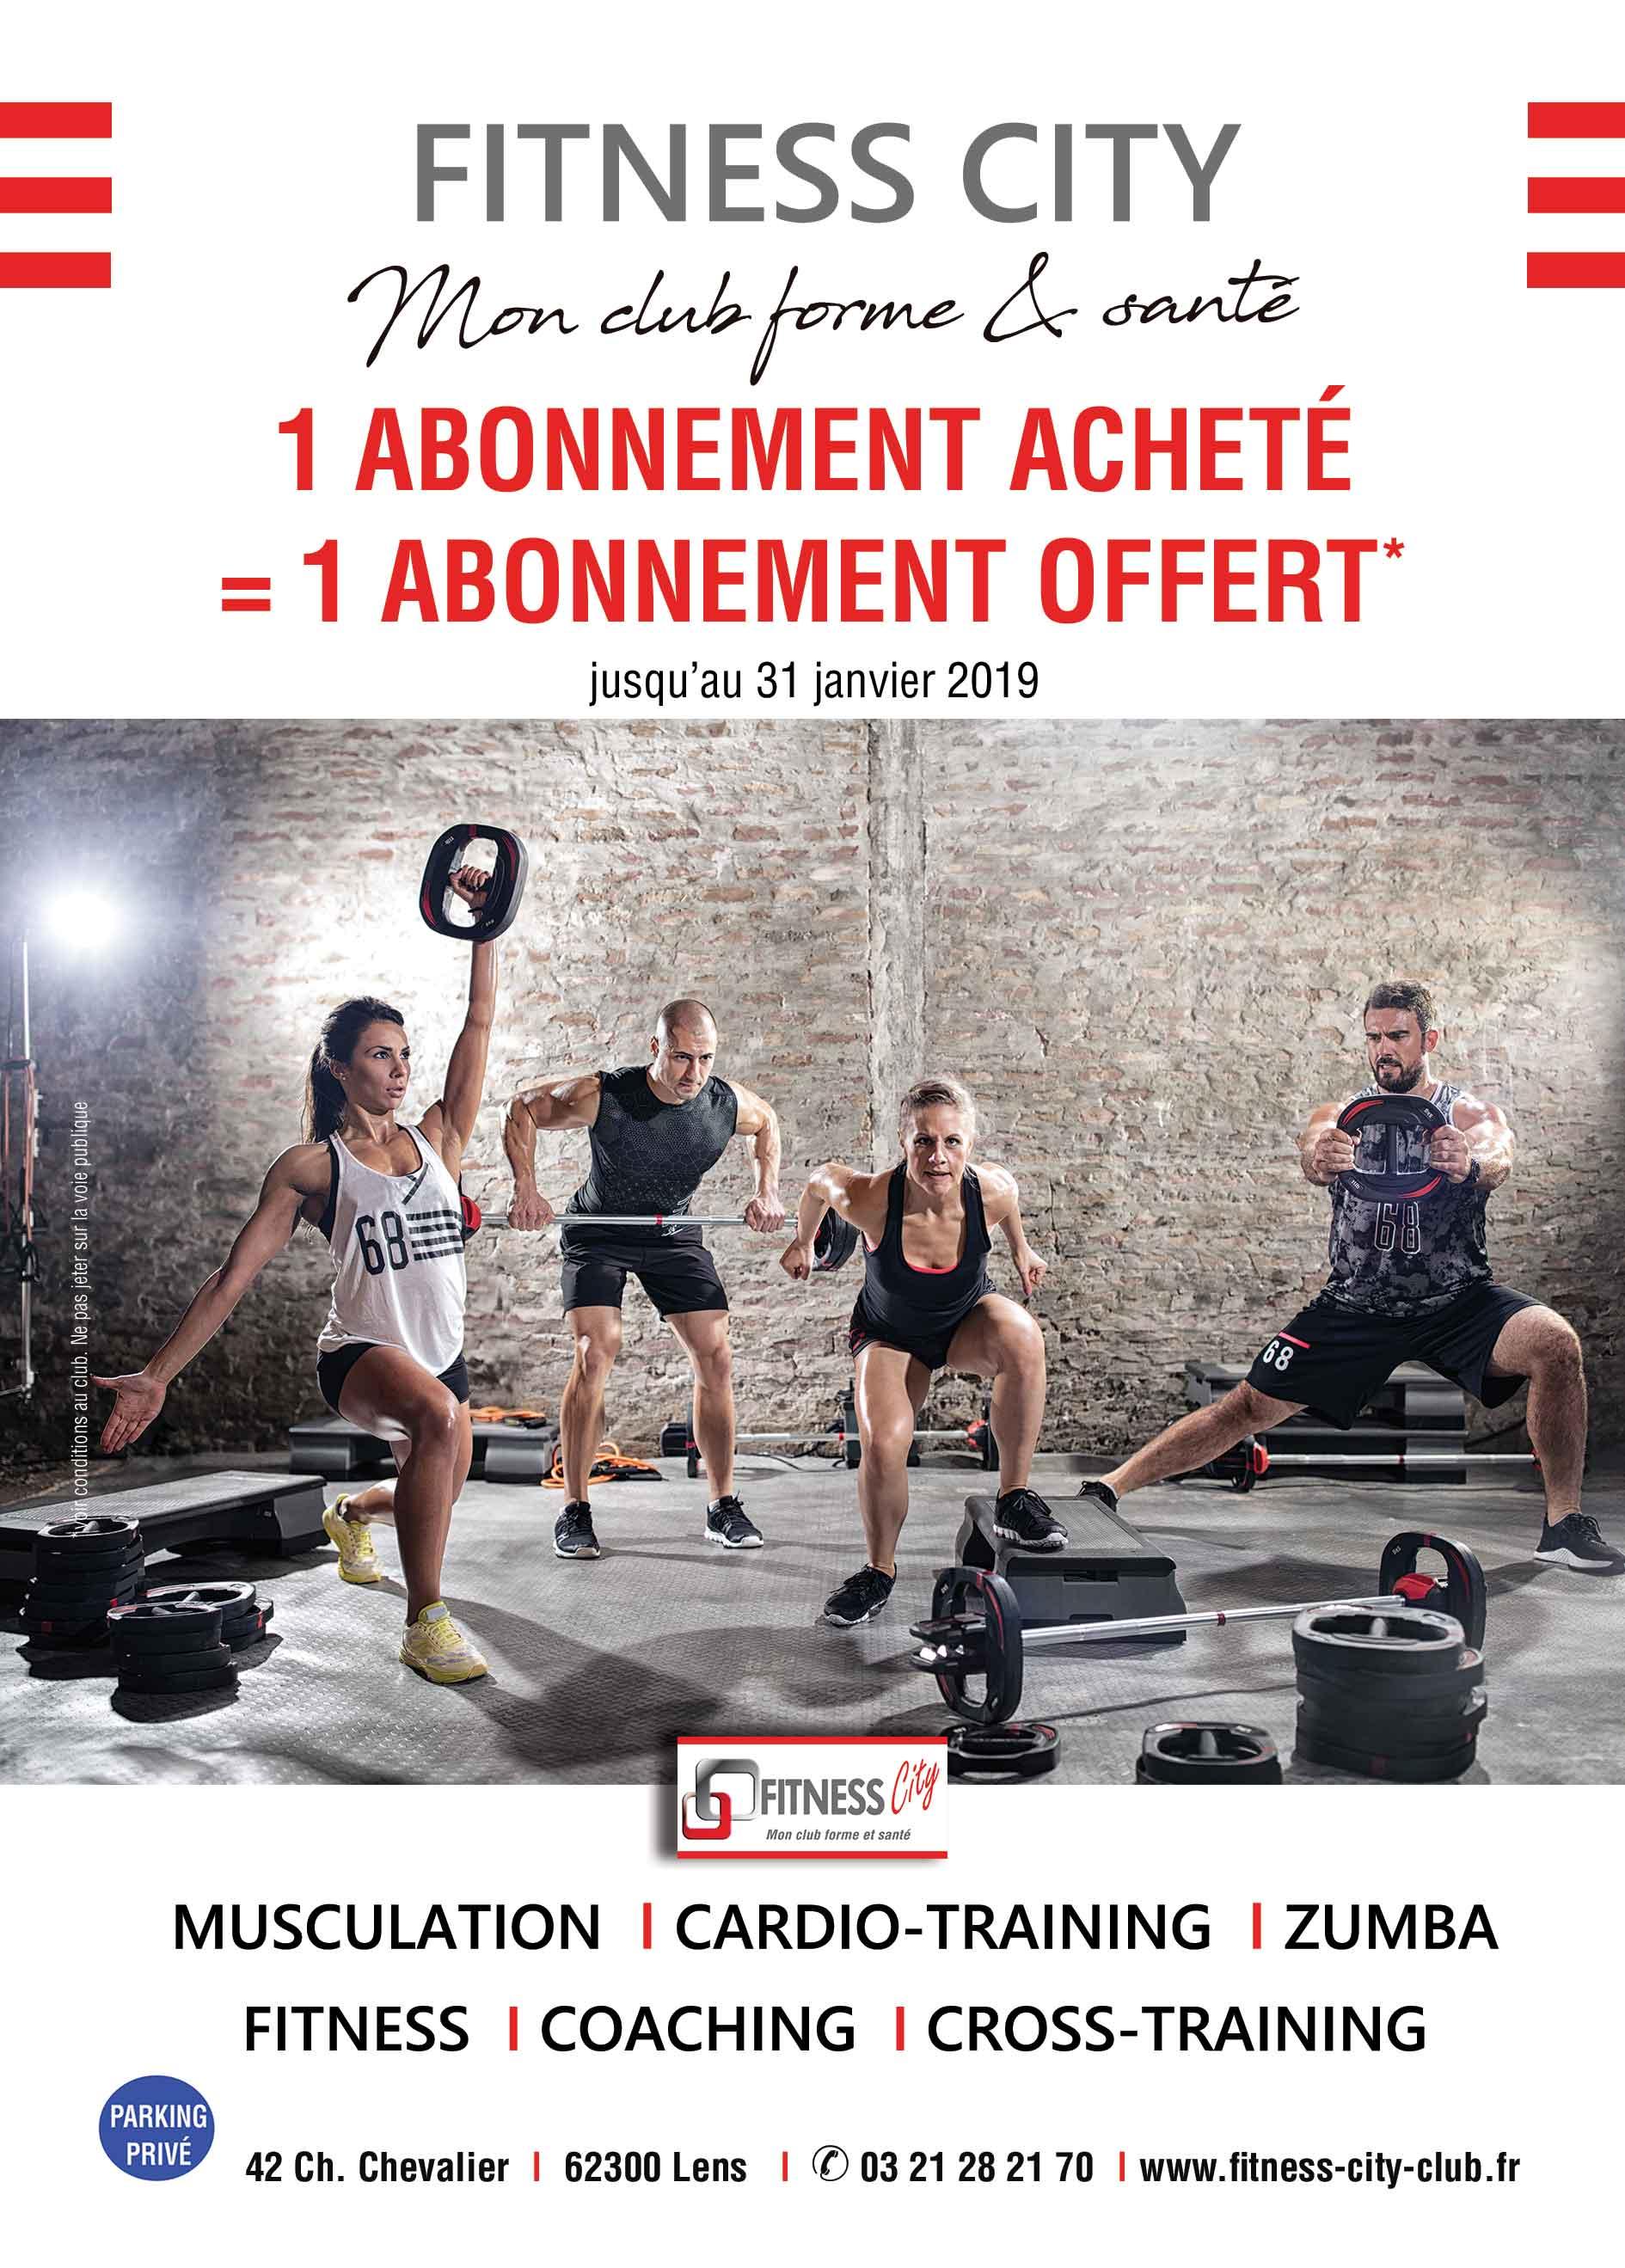 Fitness-City-flyer-A5-janv19-recto